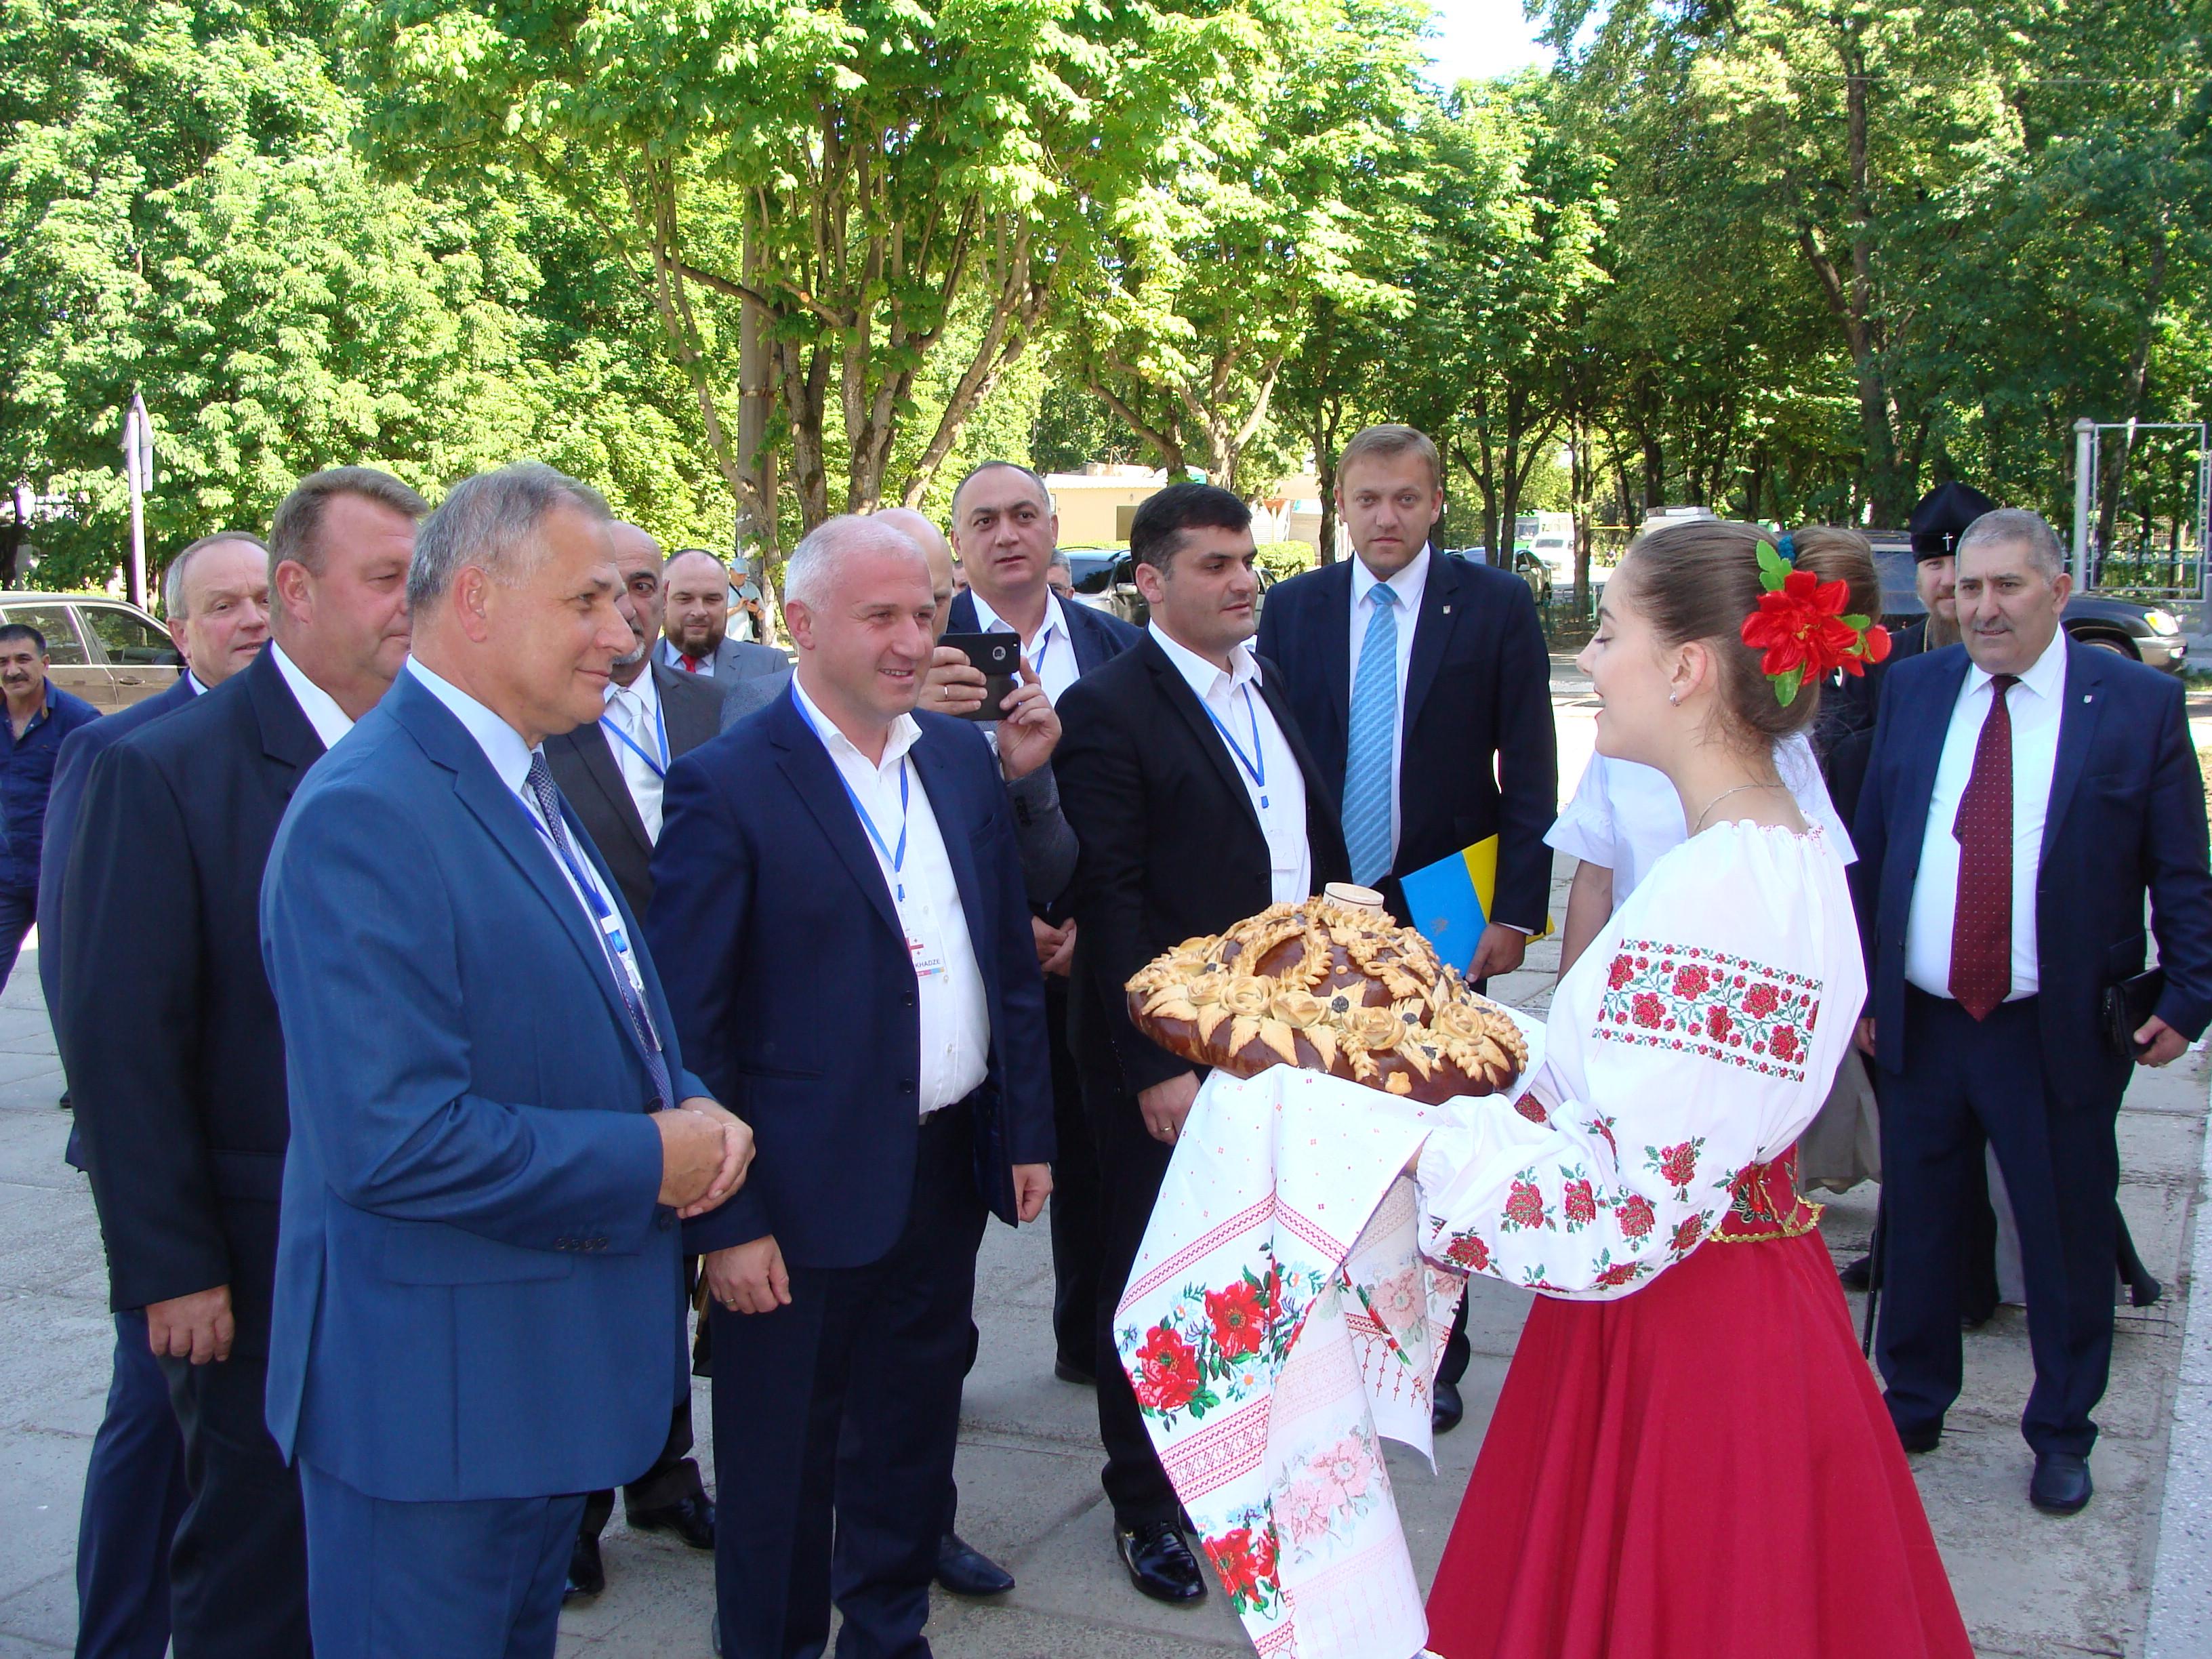 Delegacja Andrychowa na Ukrainie. Co tam robili?